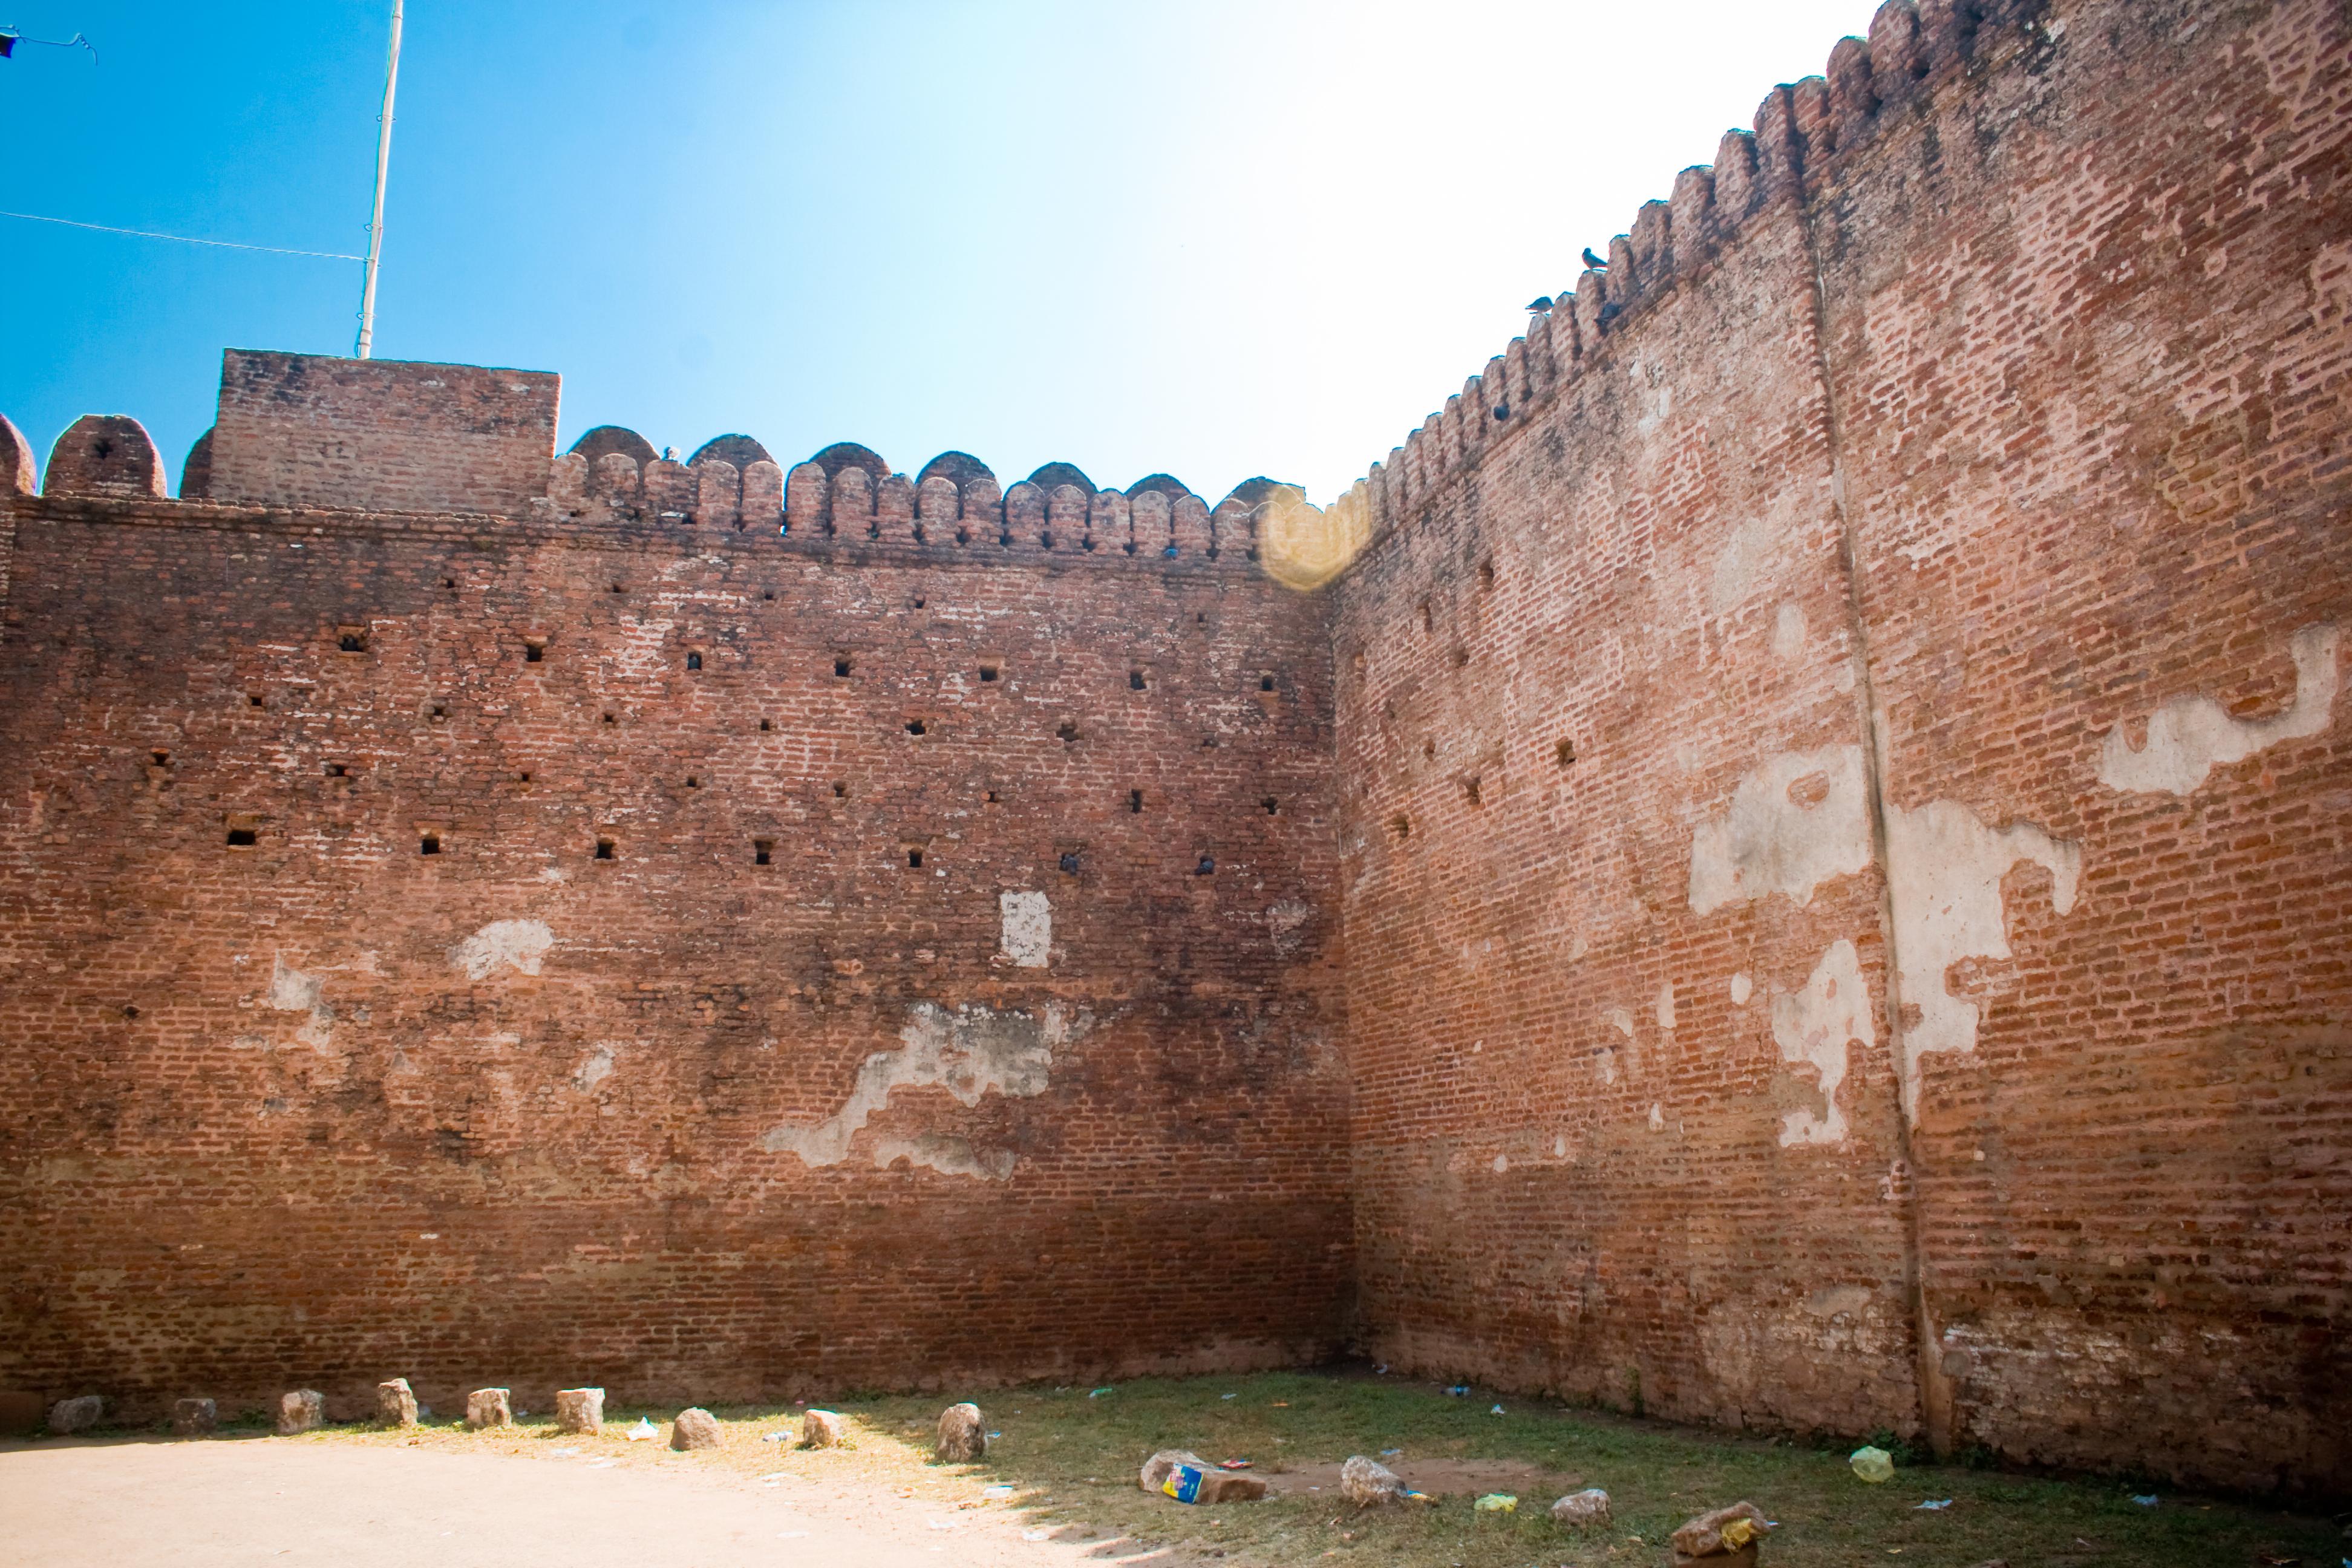 Champaner-Pavagadh Archaeological Park, Gujarat